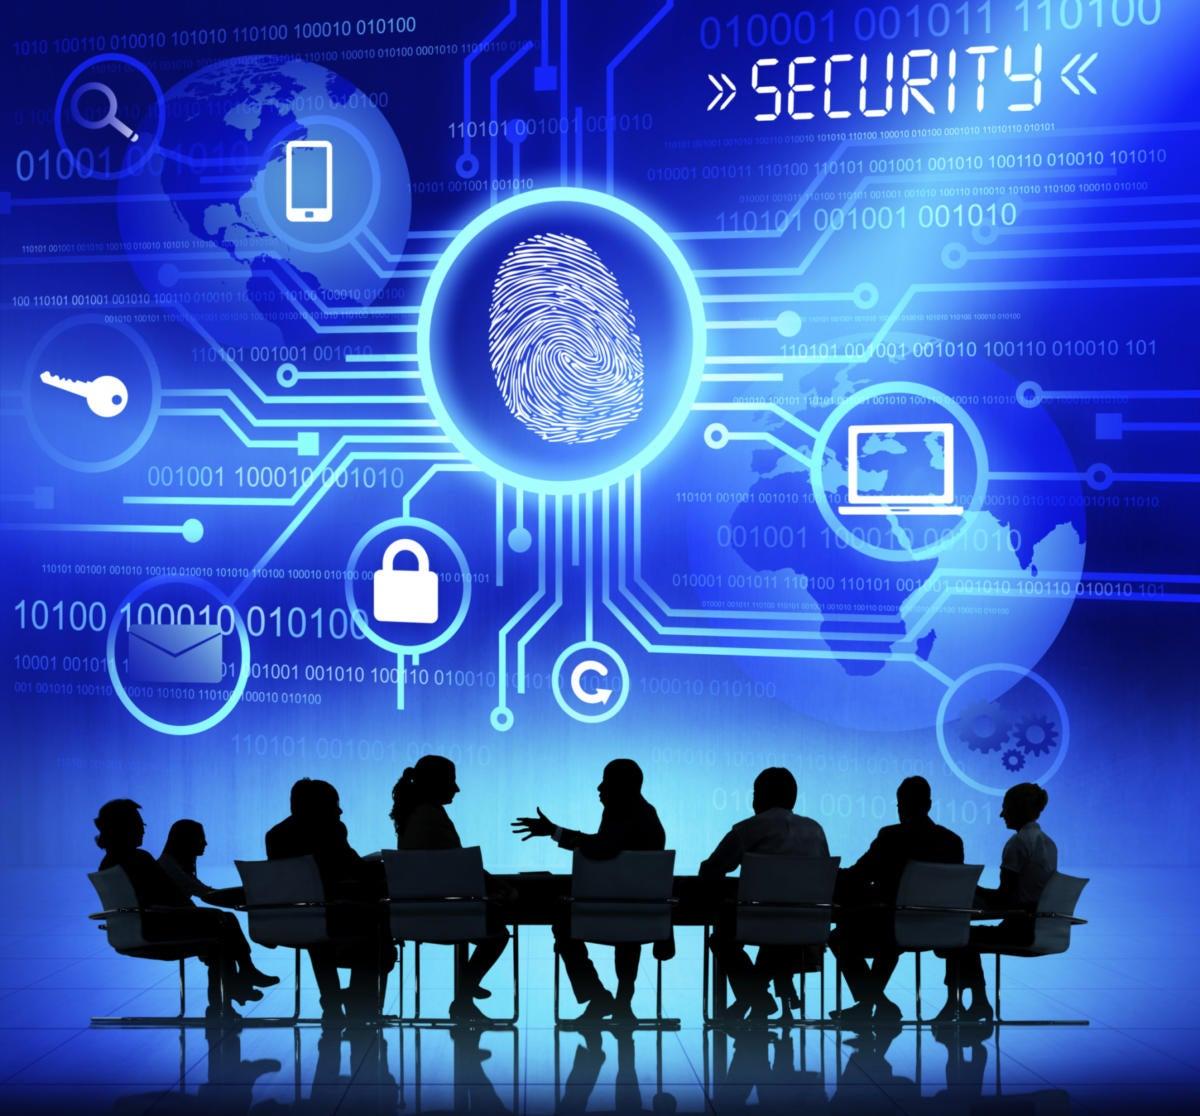 cios execs security thinkstock